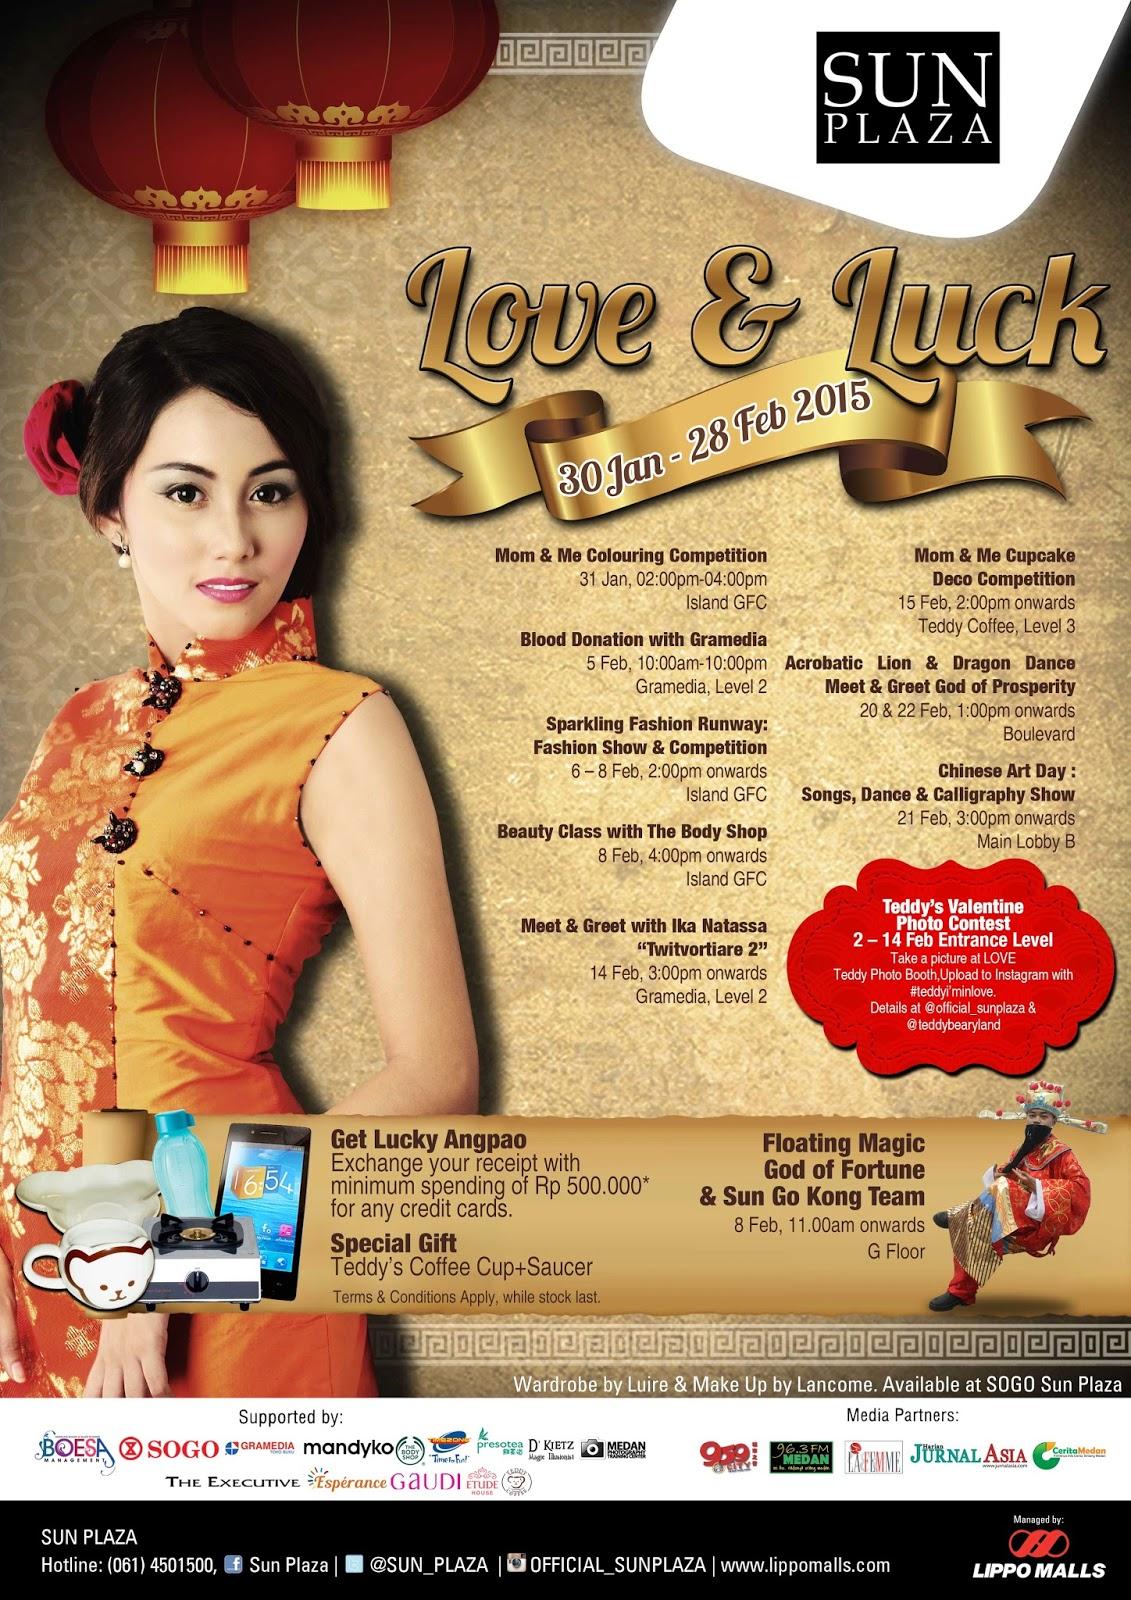 Sun Plaza Persembahkan Love & Luck di Tahun Baru Imlek 2566